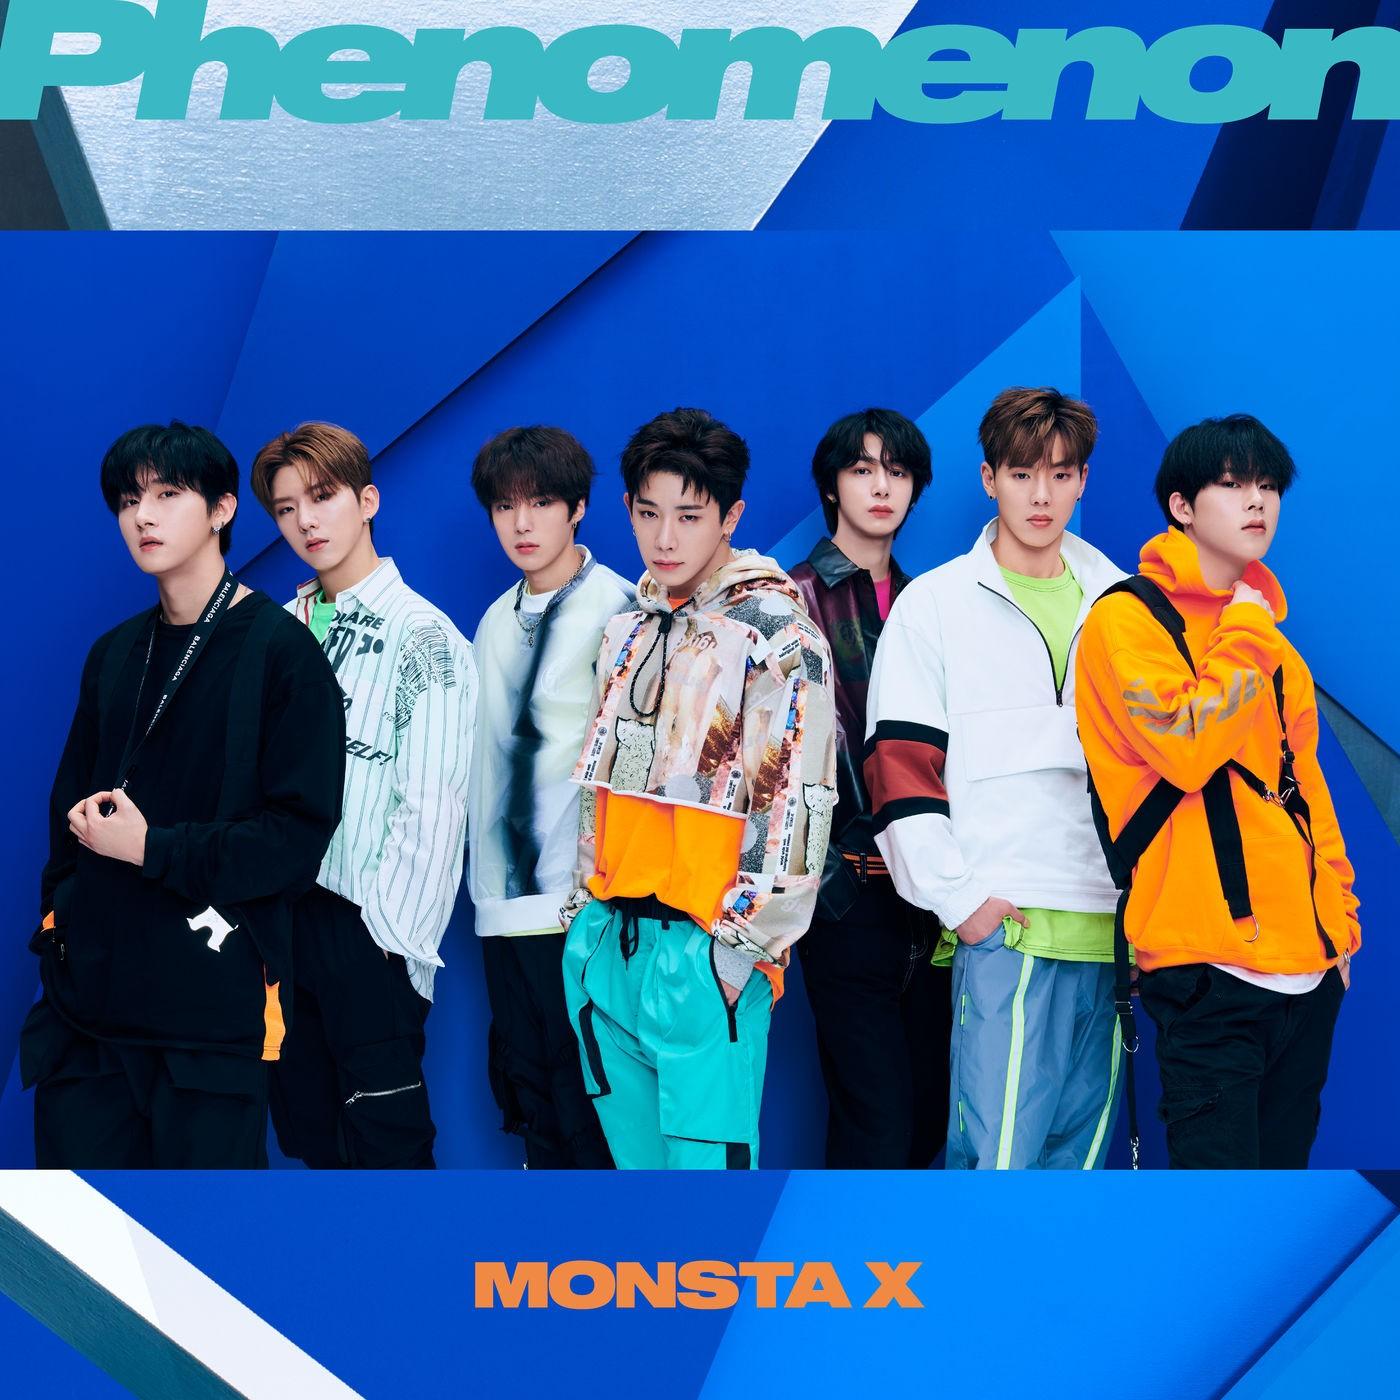 MONSTA X – Phenomenon [FLAC + MP3 320] [2019.08.21]